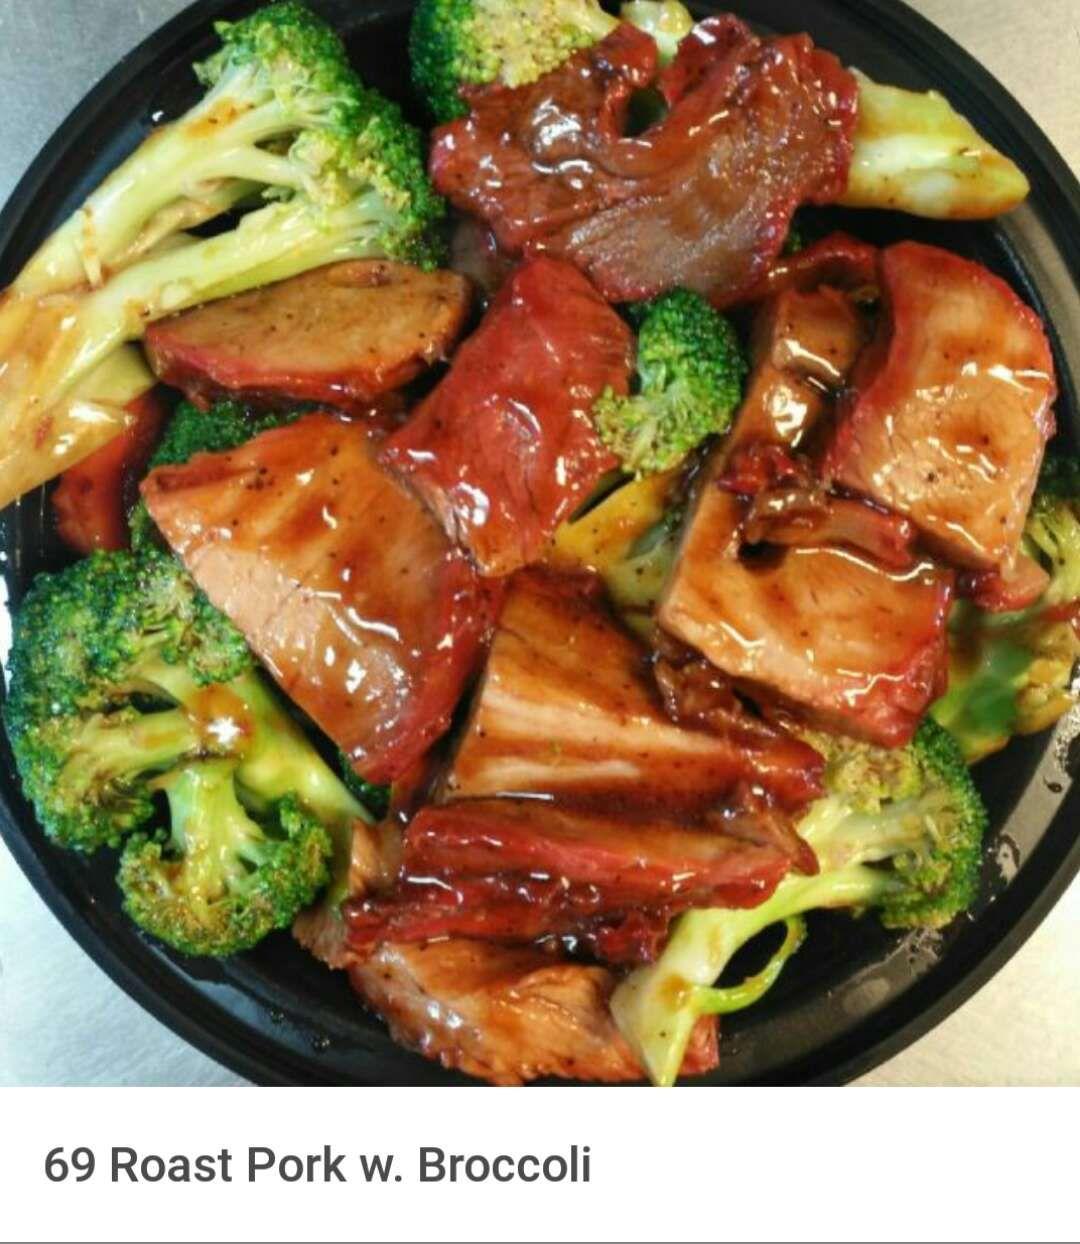 69. Roast Pork w. Broccoli Image